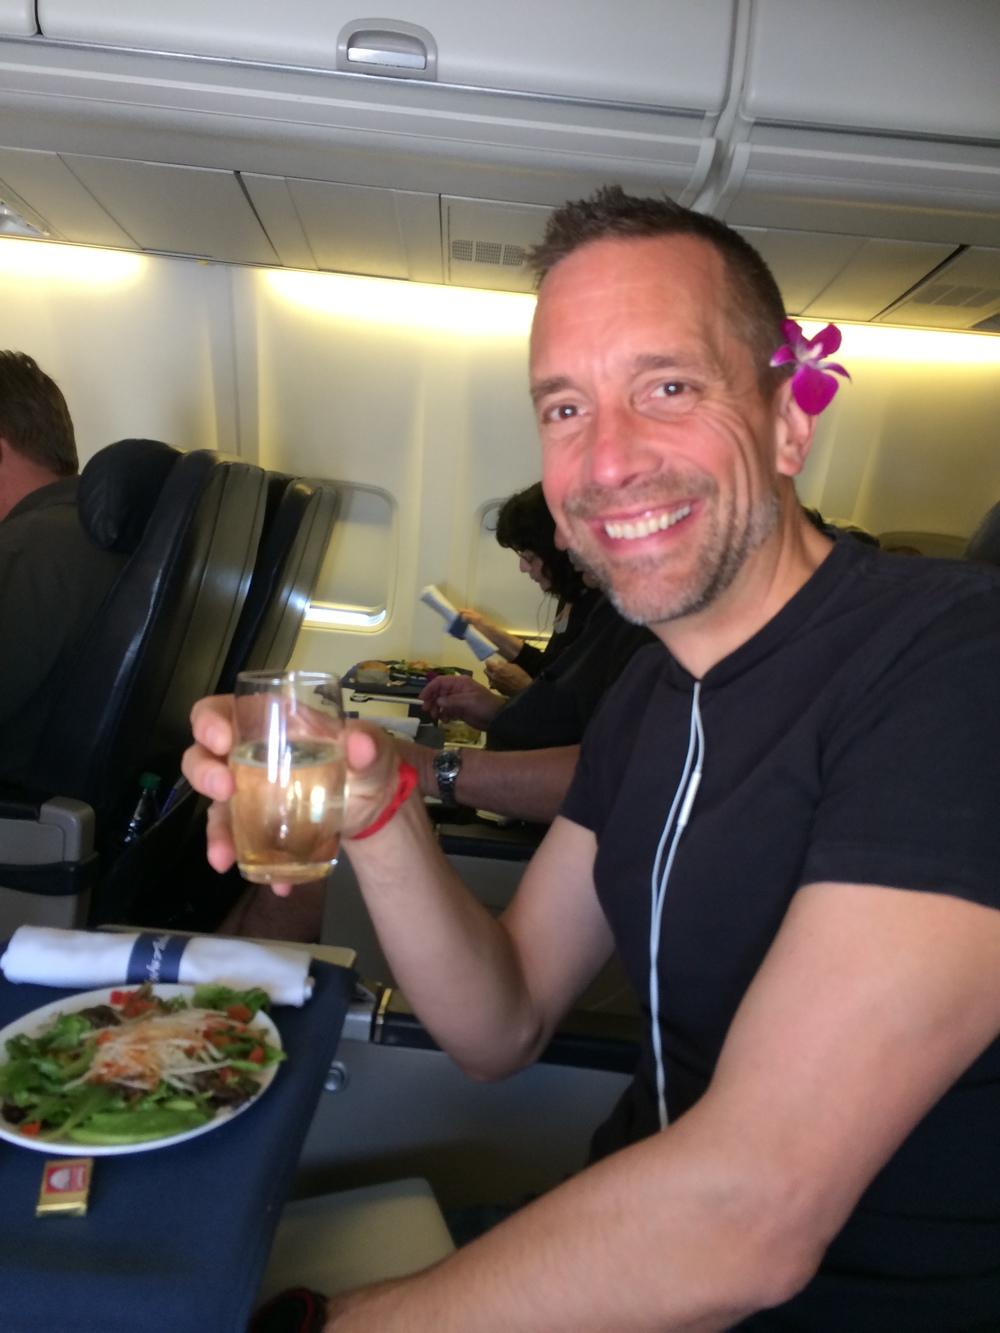 We got upgraded on Alaska Airlines. Love them!